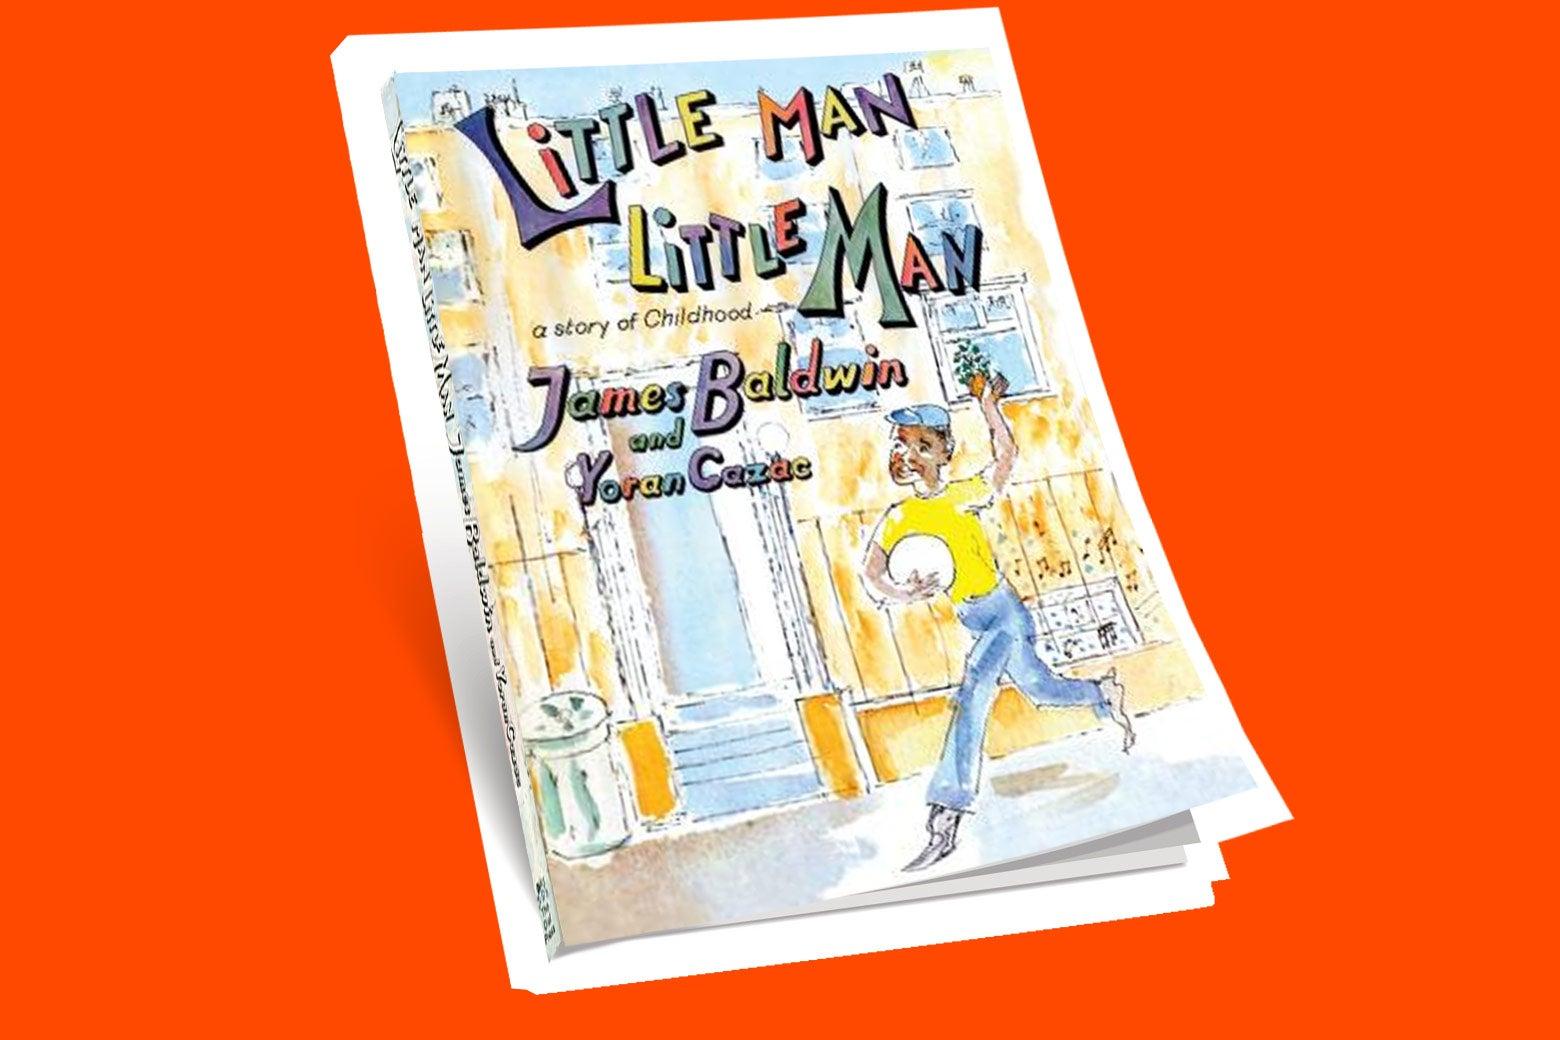 The cover of James Baldwin's Little Man, Little Man.